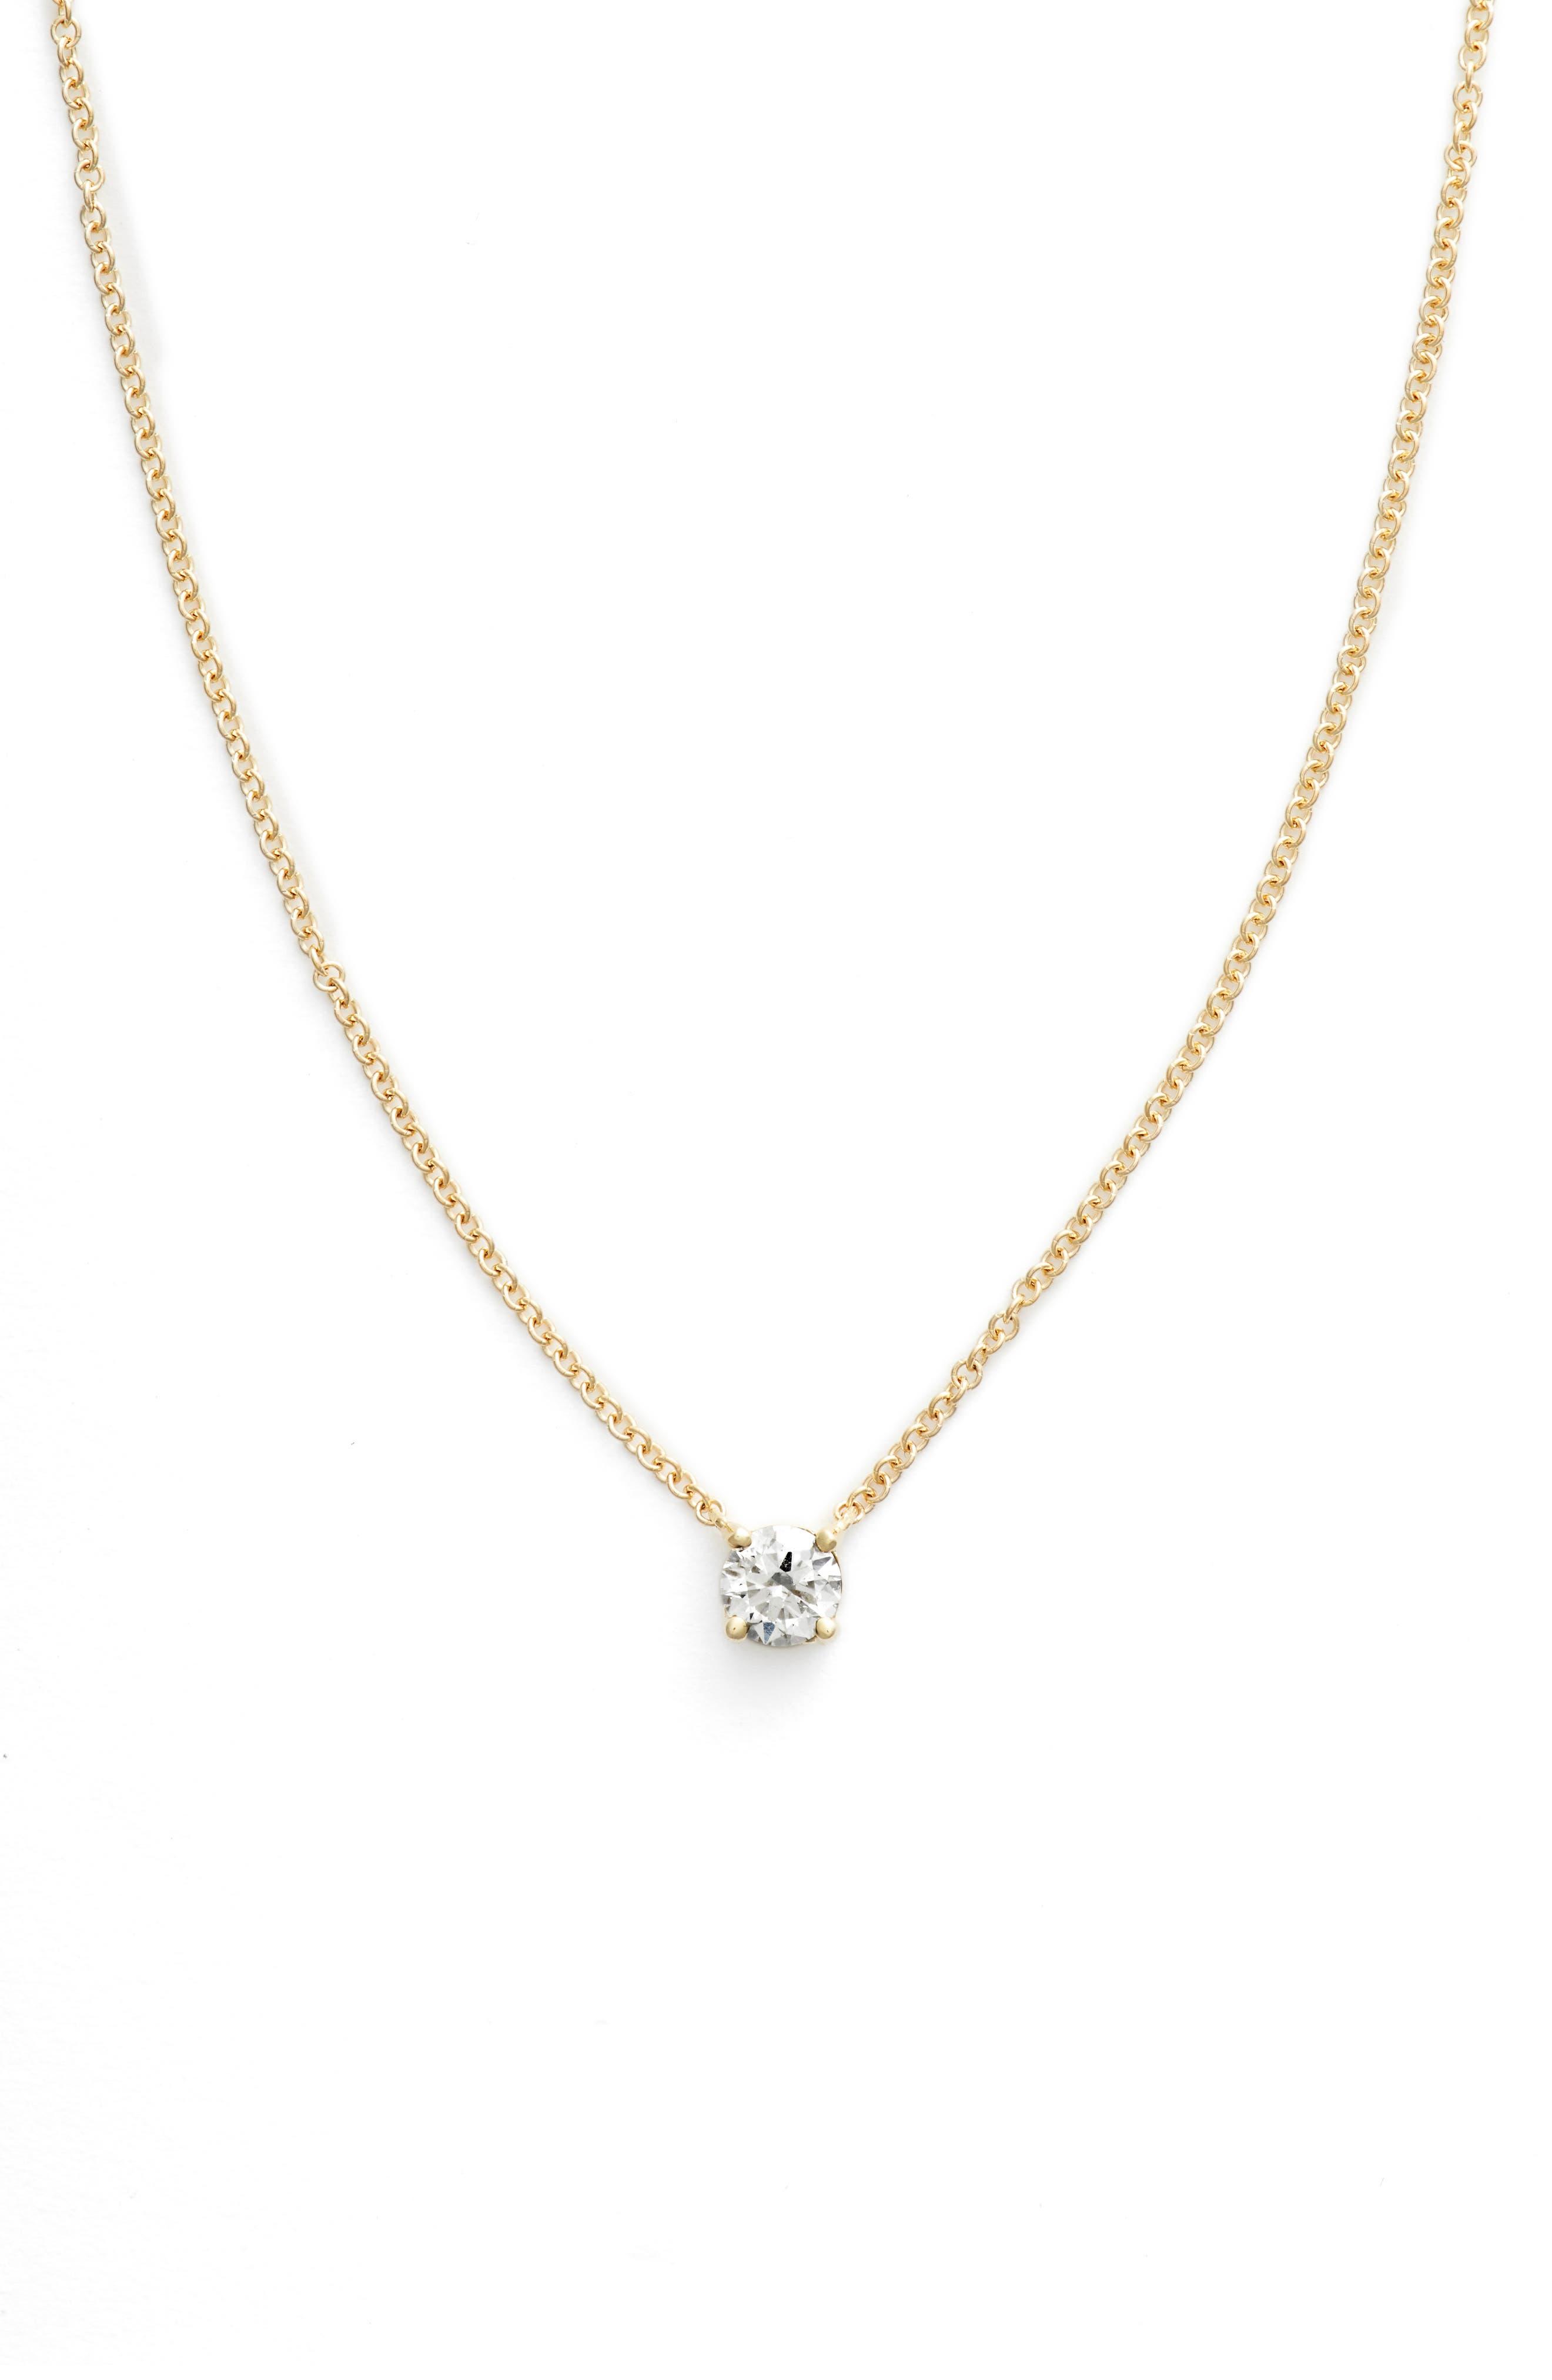 Liora Solitaire Diamond Pendant Necklace,                             Main thumbnail 1, color,                             Yellow Gold